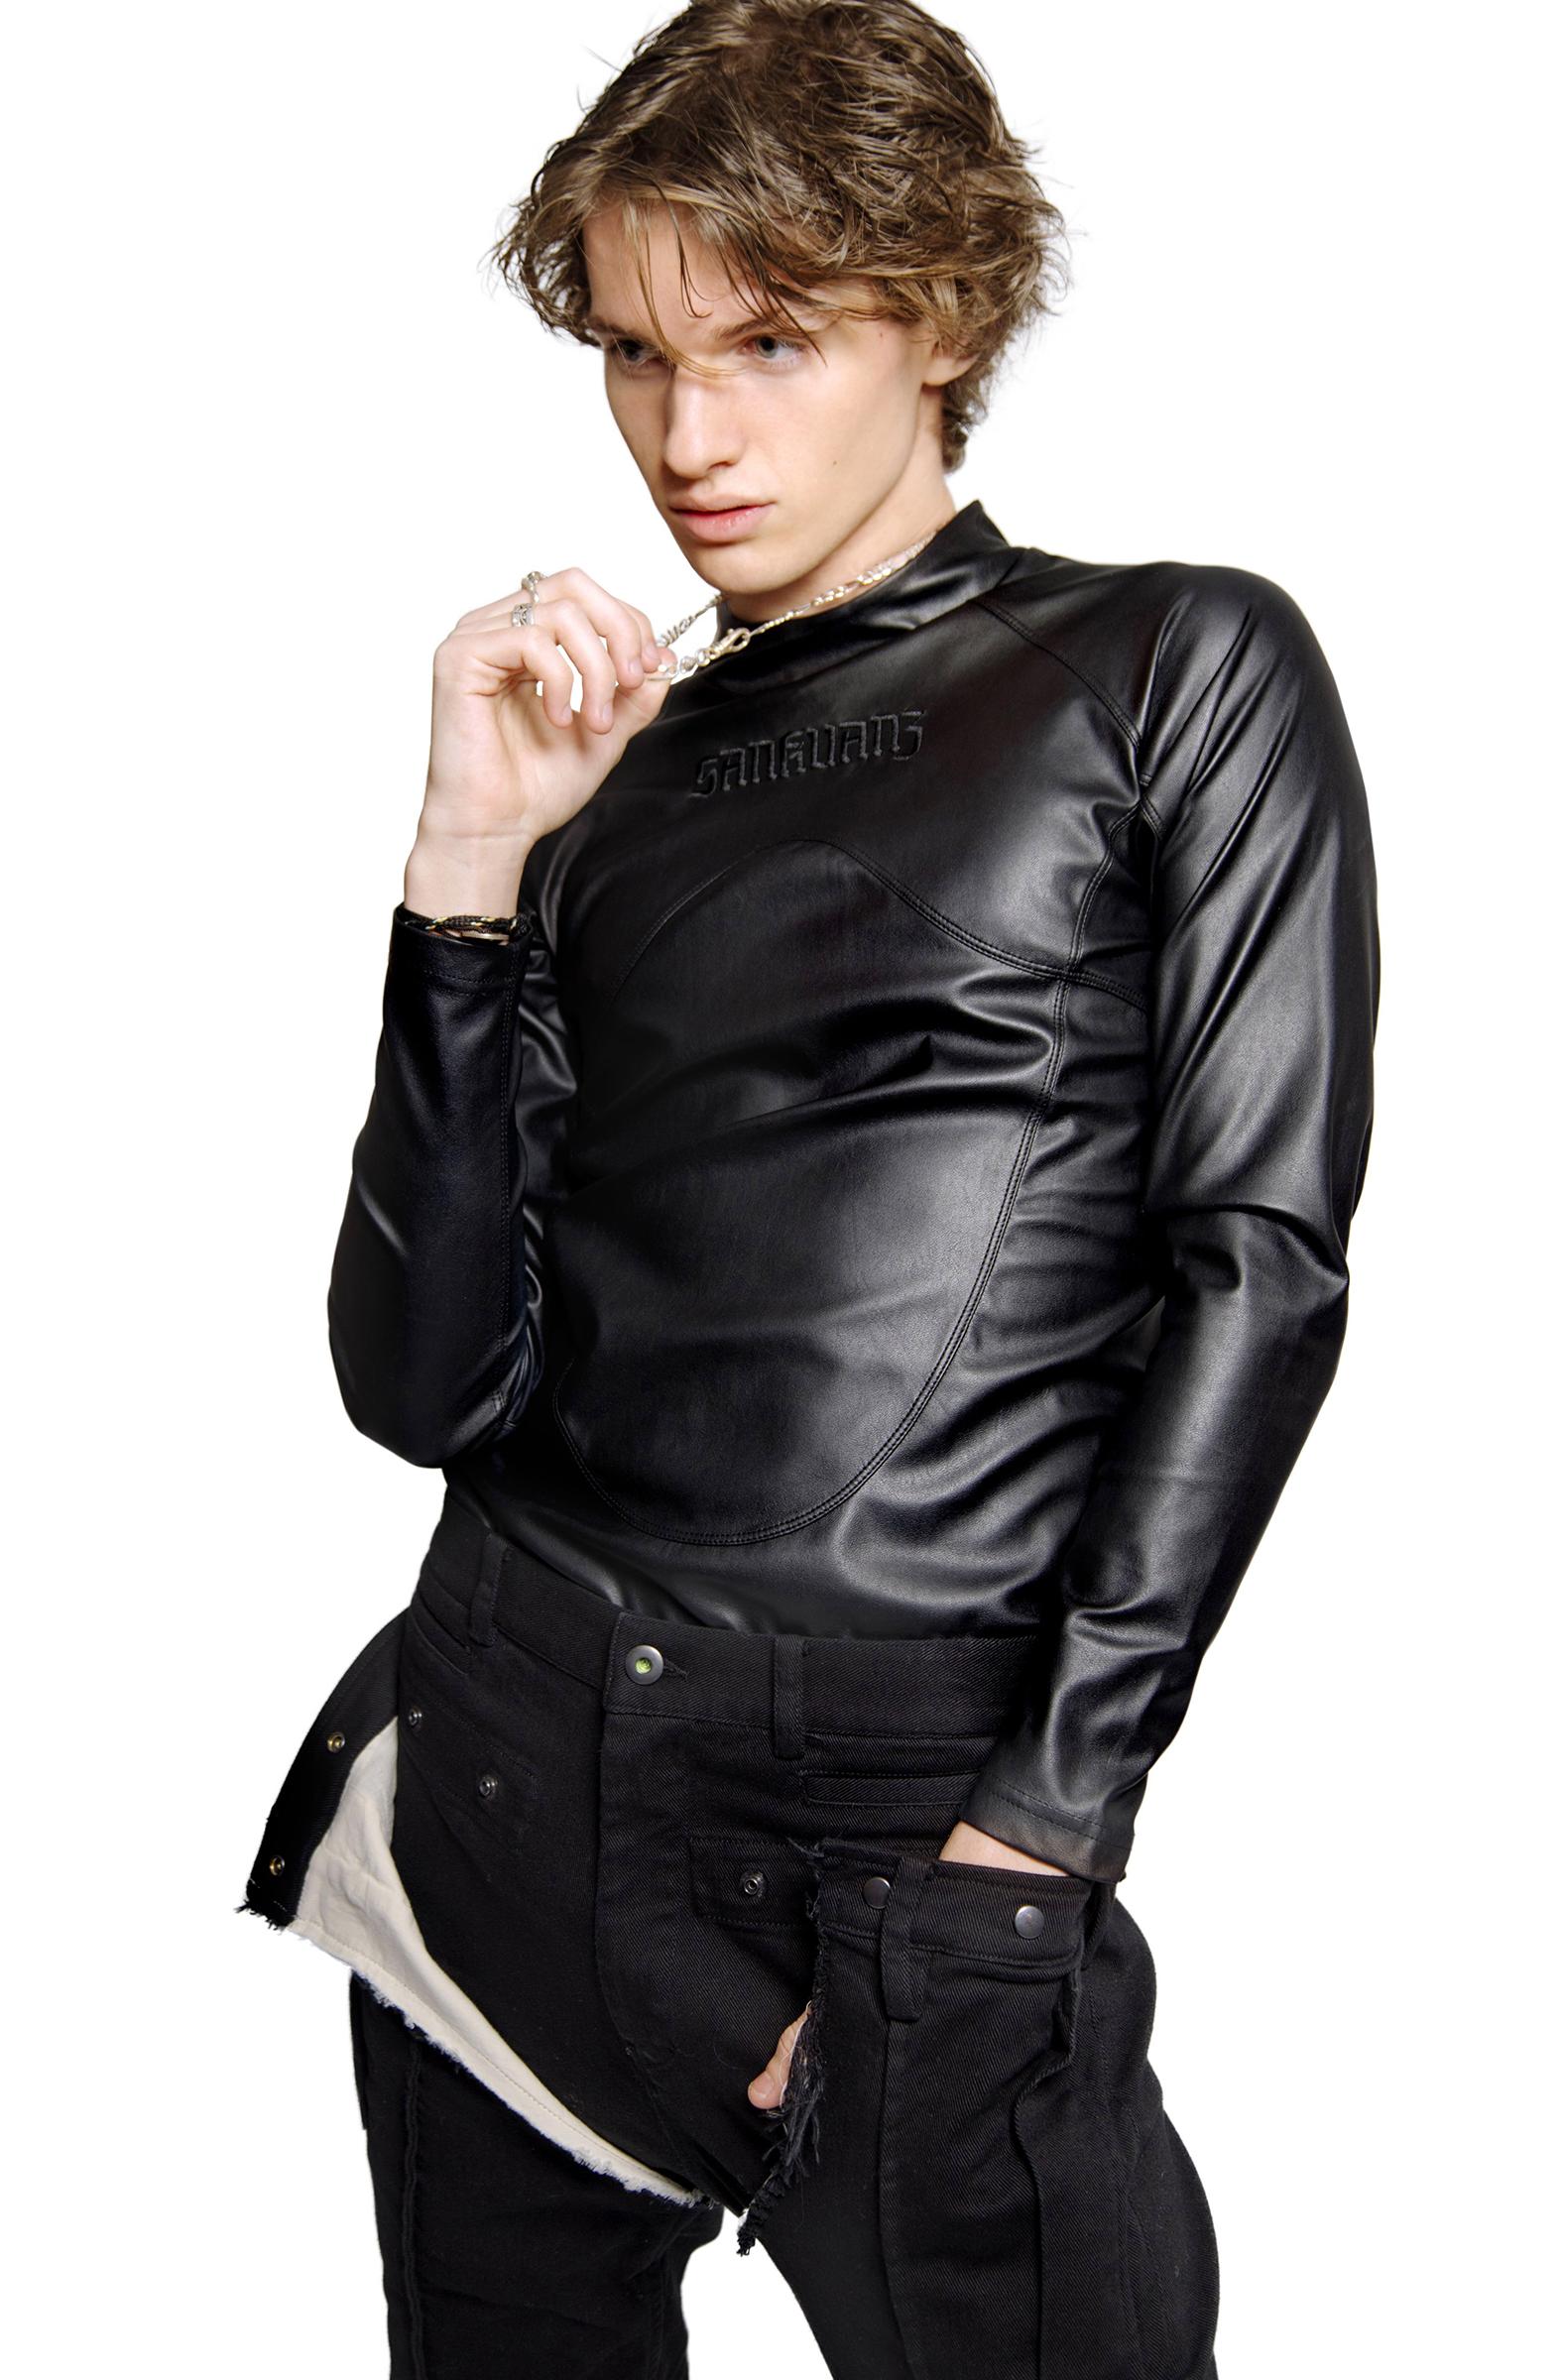 Alexandre by Kimdary Yin fashion photographer and Art Director